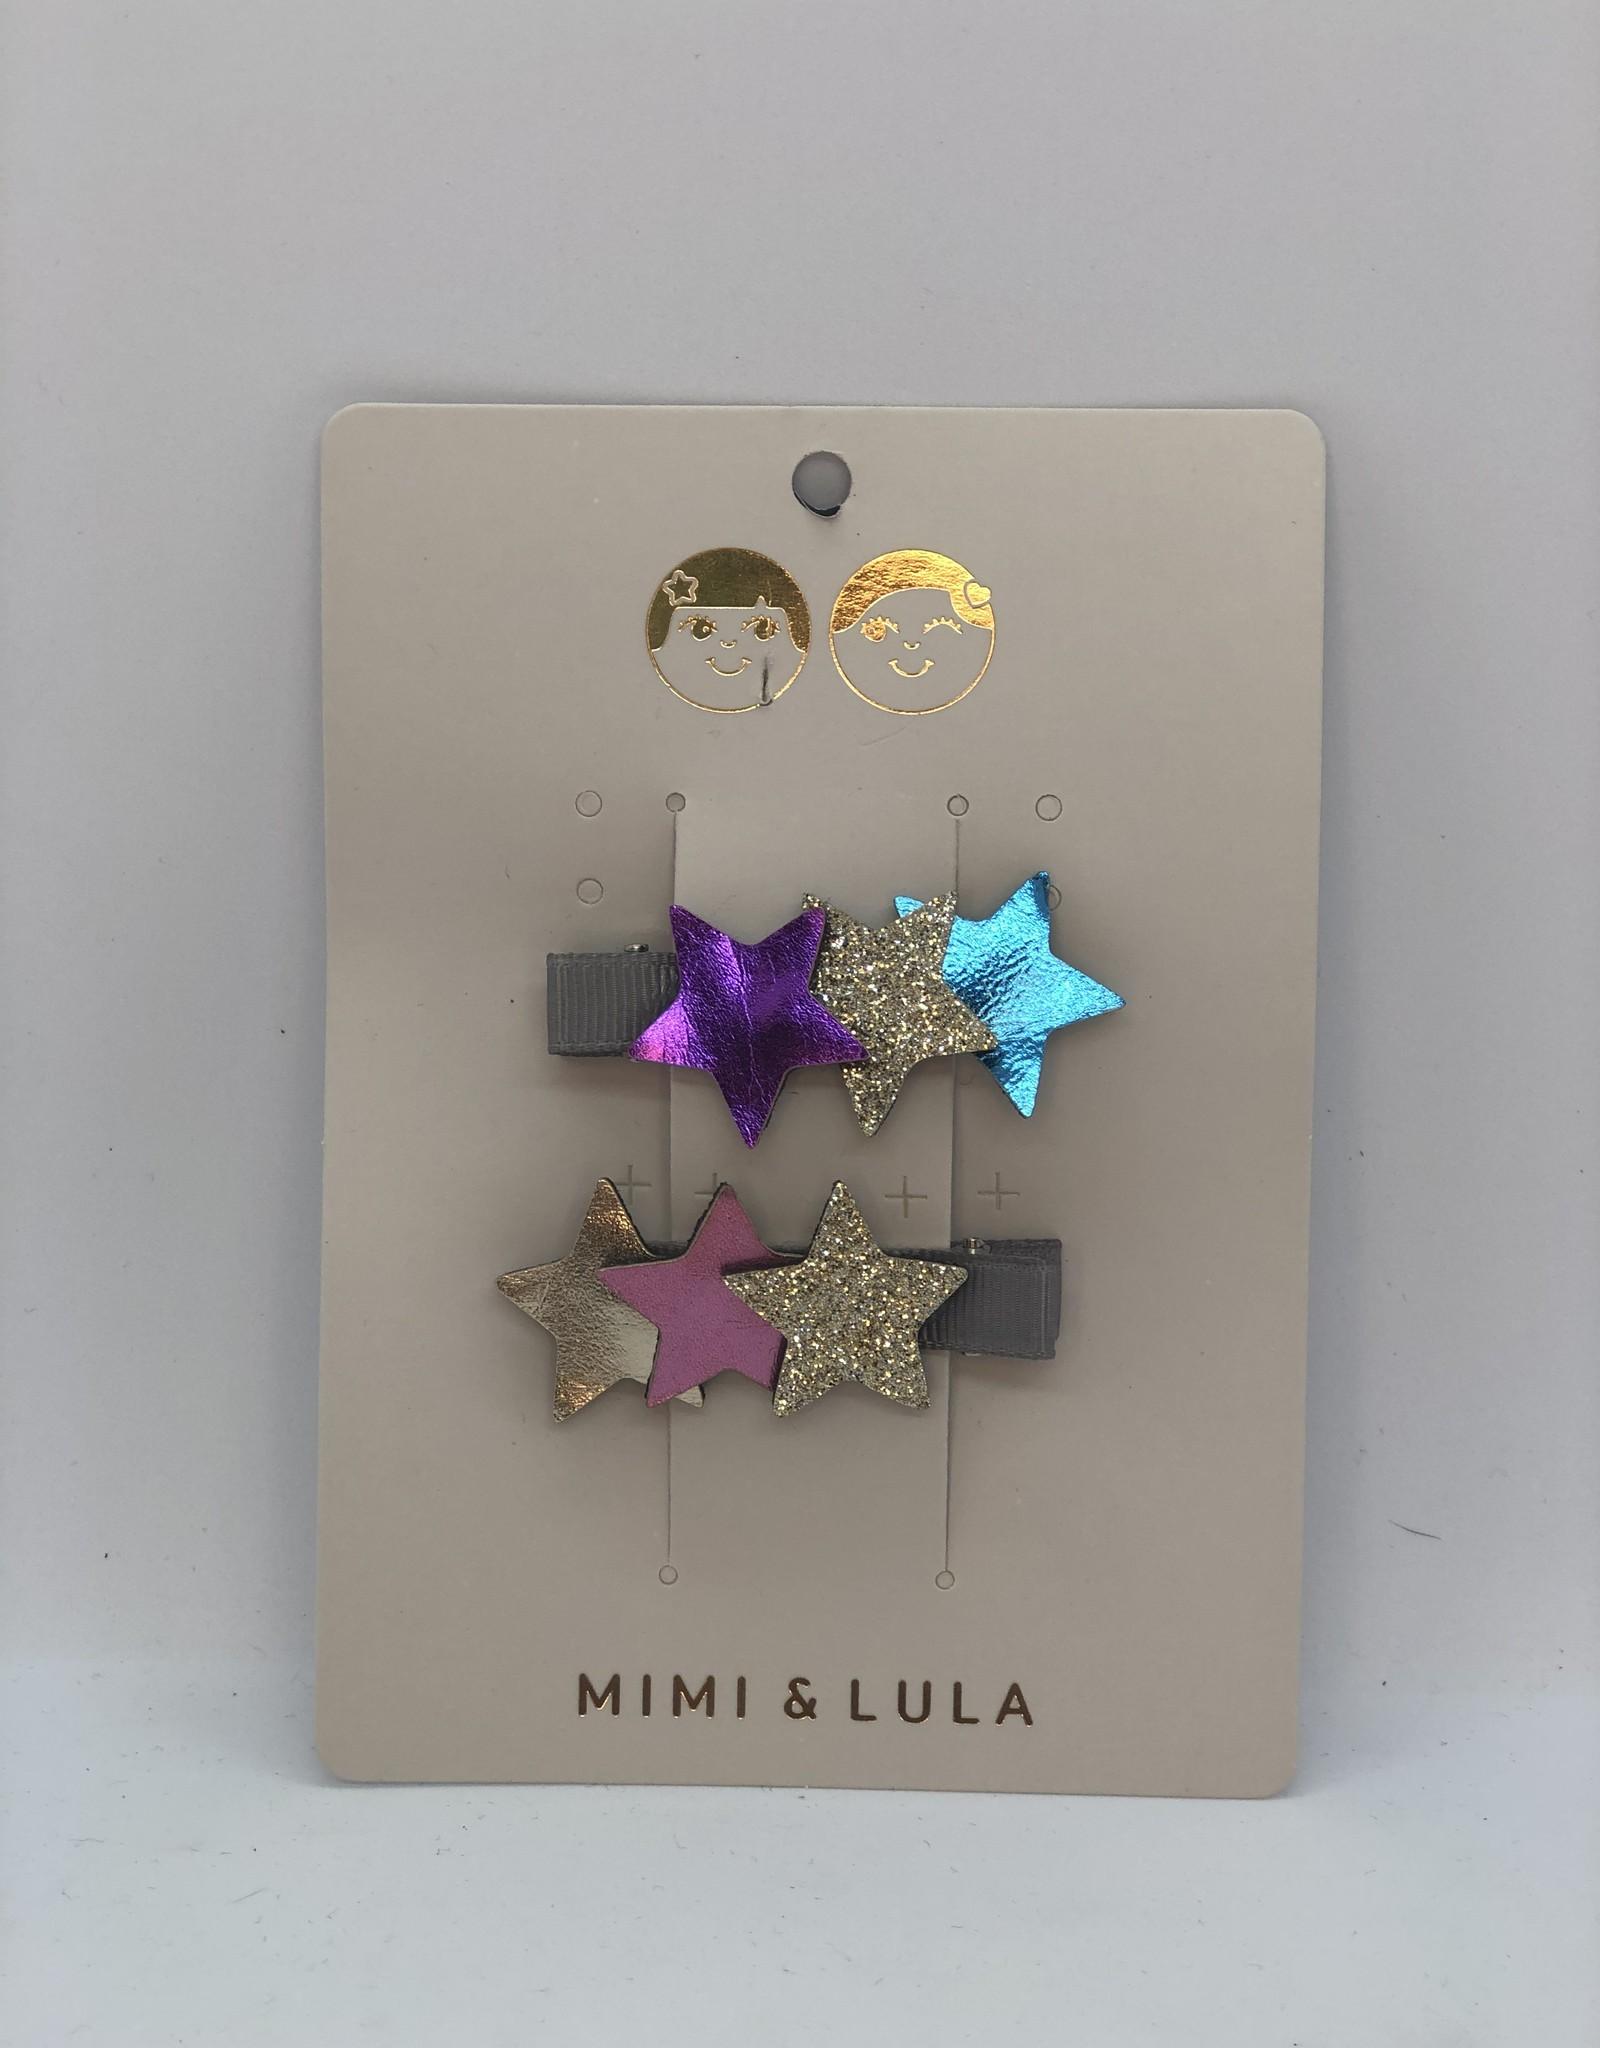 Mimi & Lula clip sterren (2)